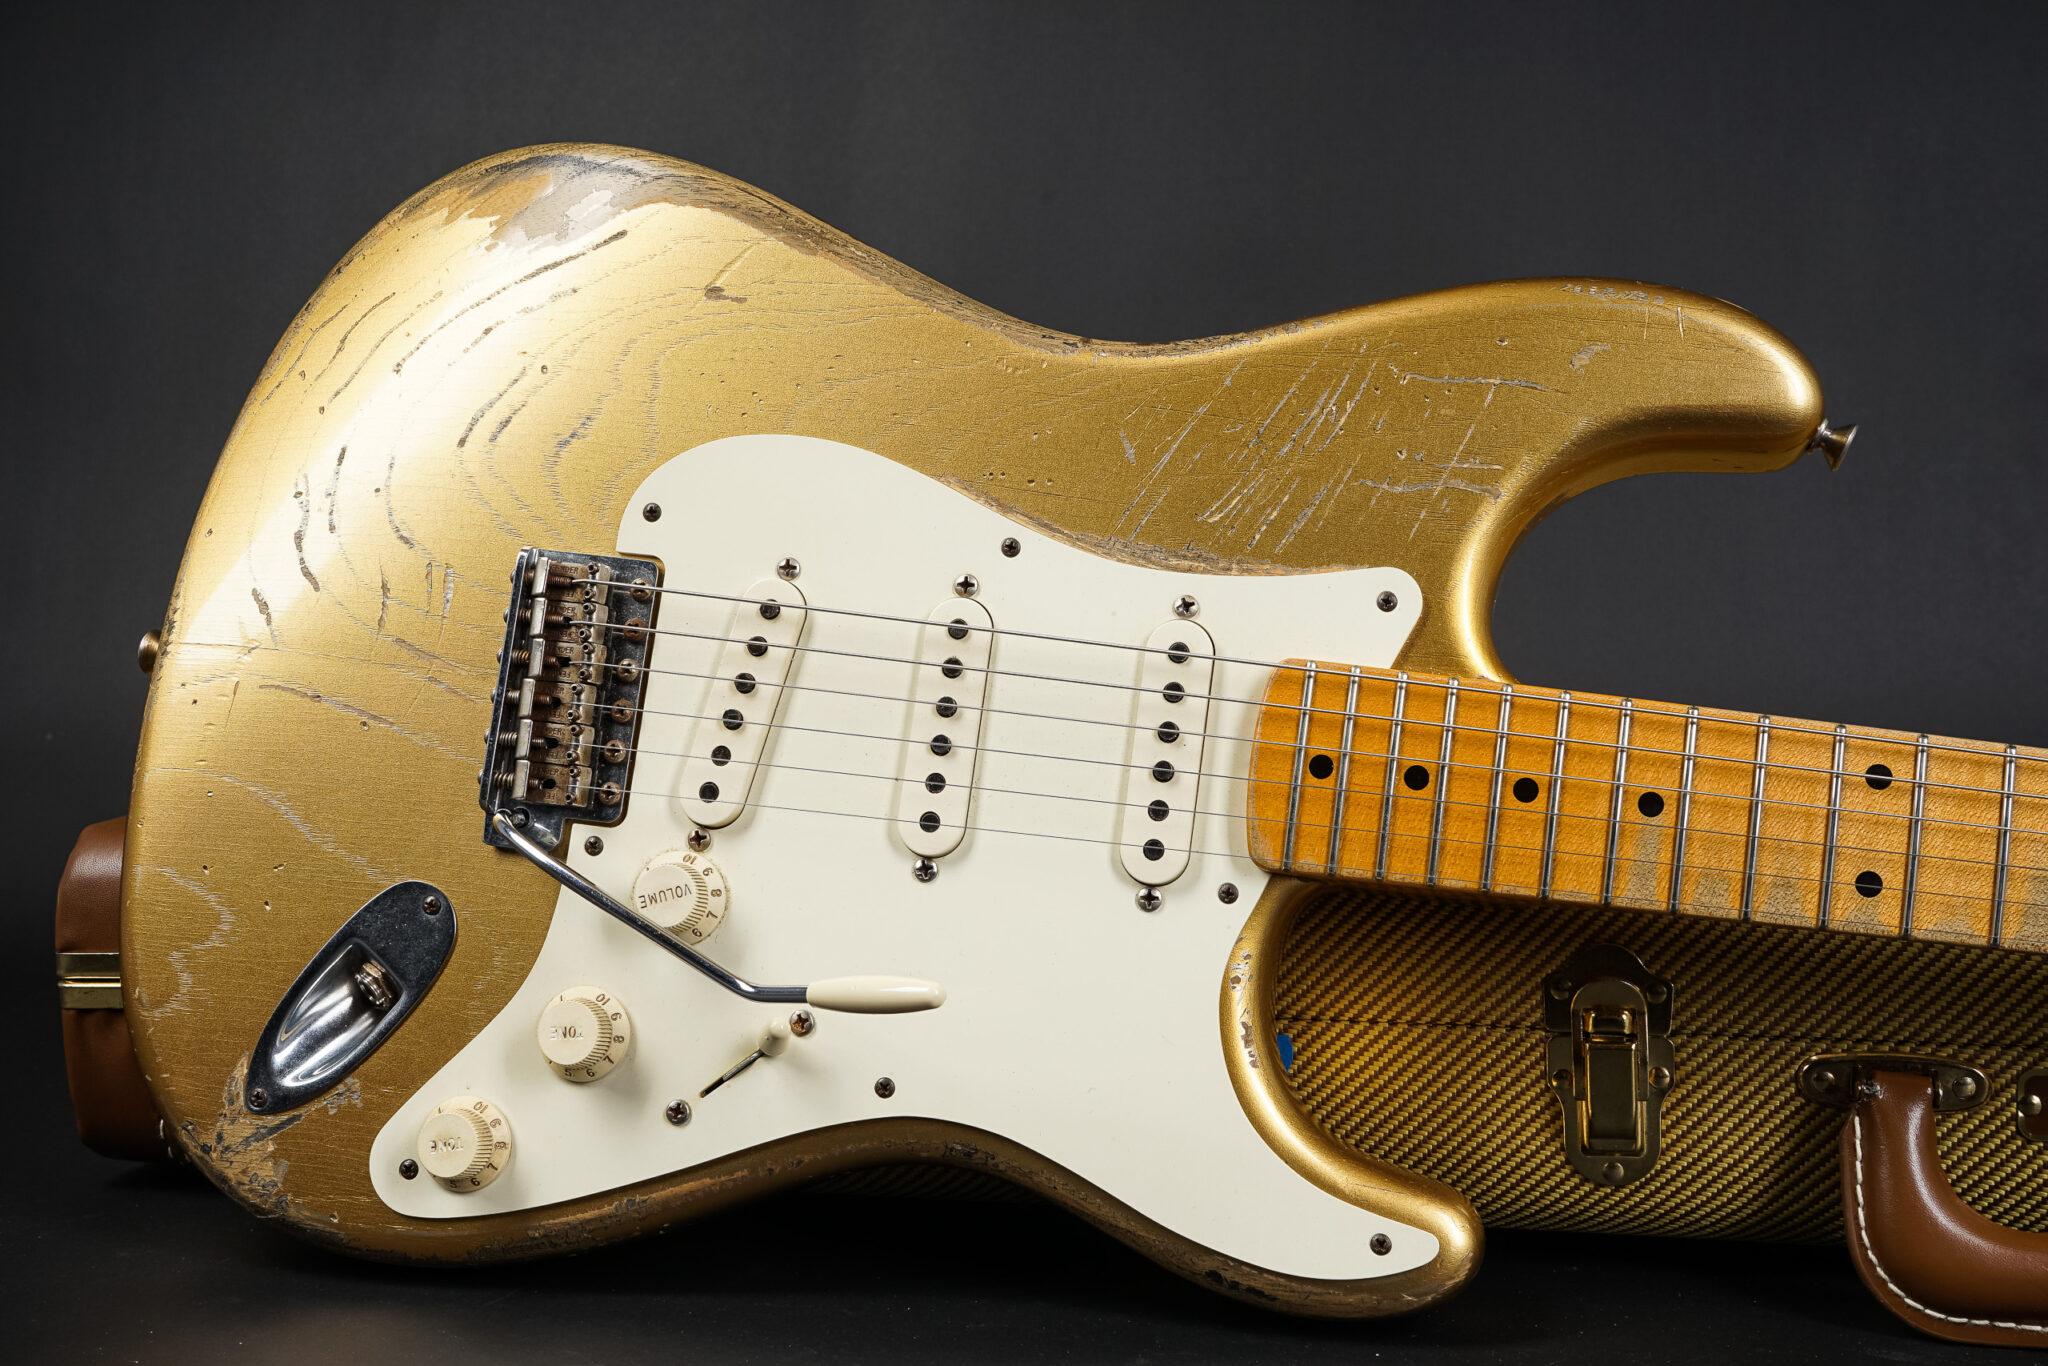 https://guitarpoint.de/app/uploads/products/2012-dennis-galuszka-masterbuilt-1957-heavy-relic-stratocaster-hle-gold-289kg/2012-Fender-1957-Masterbuilt-Galuszka-HLE-Gold-R67576-8-2048x1366.jpg